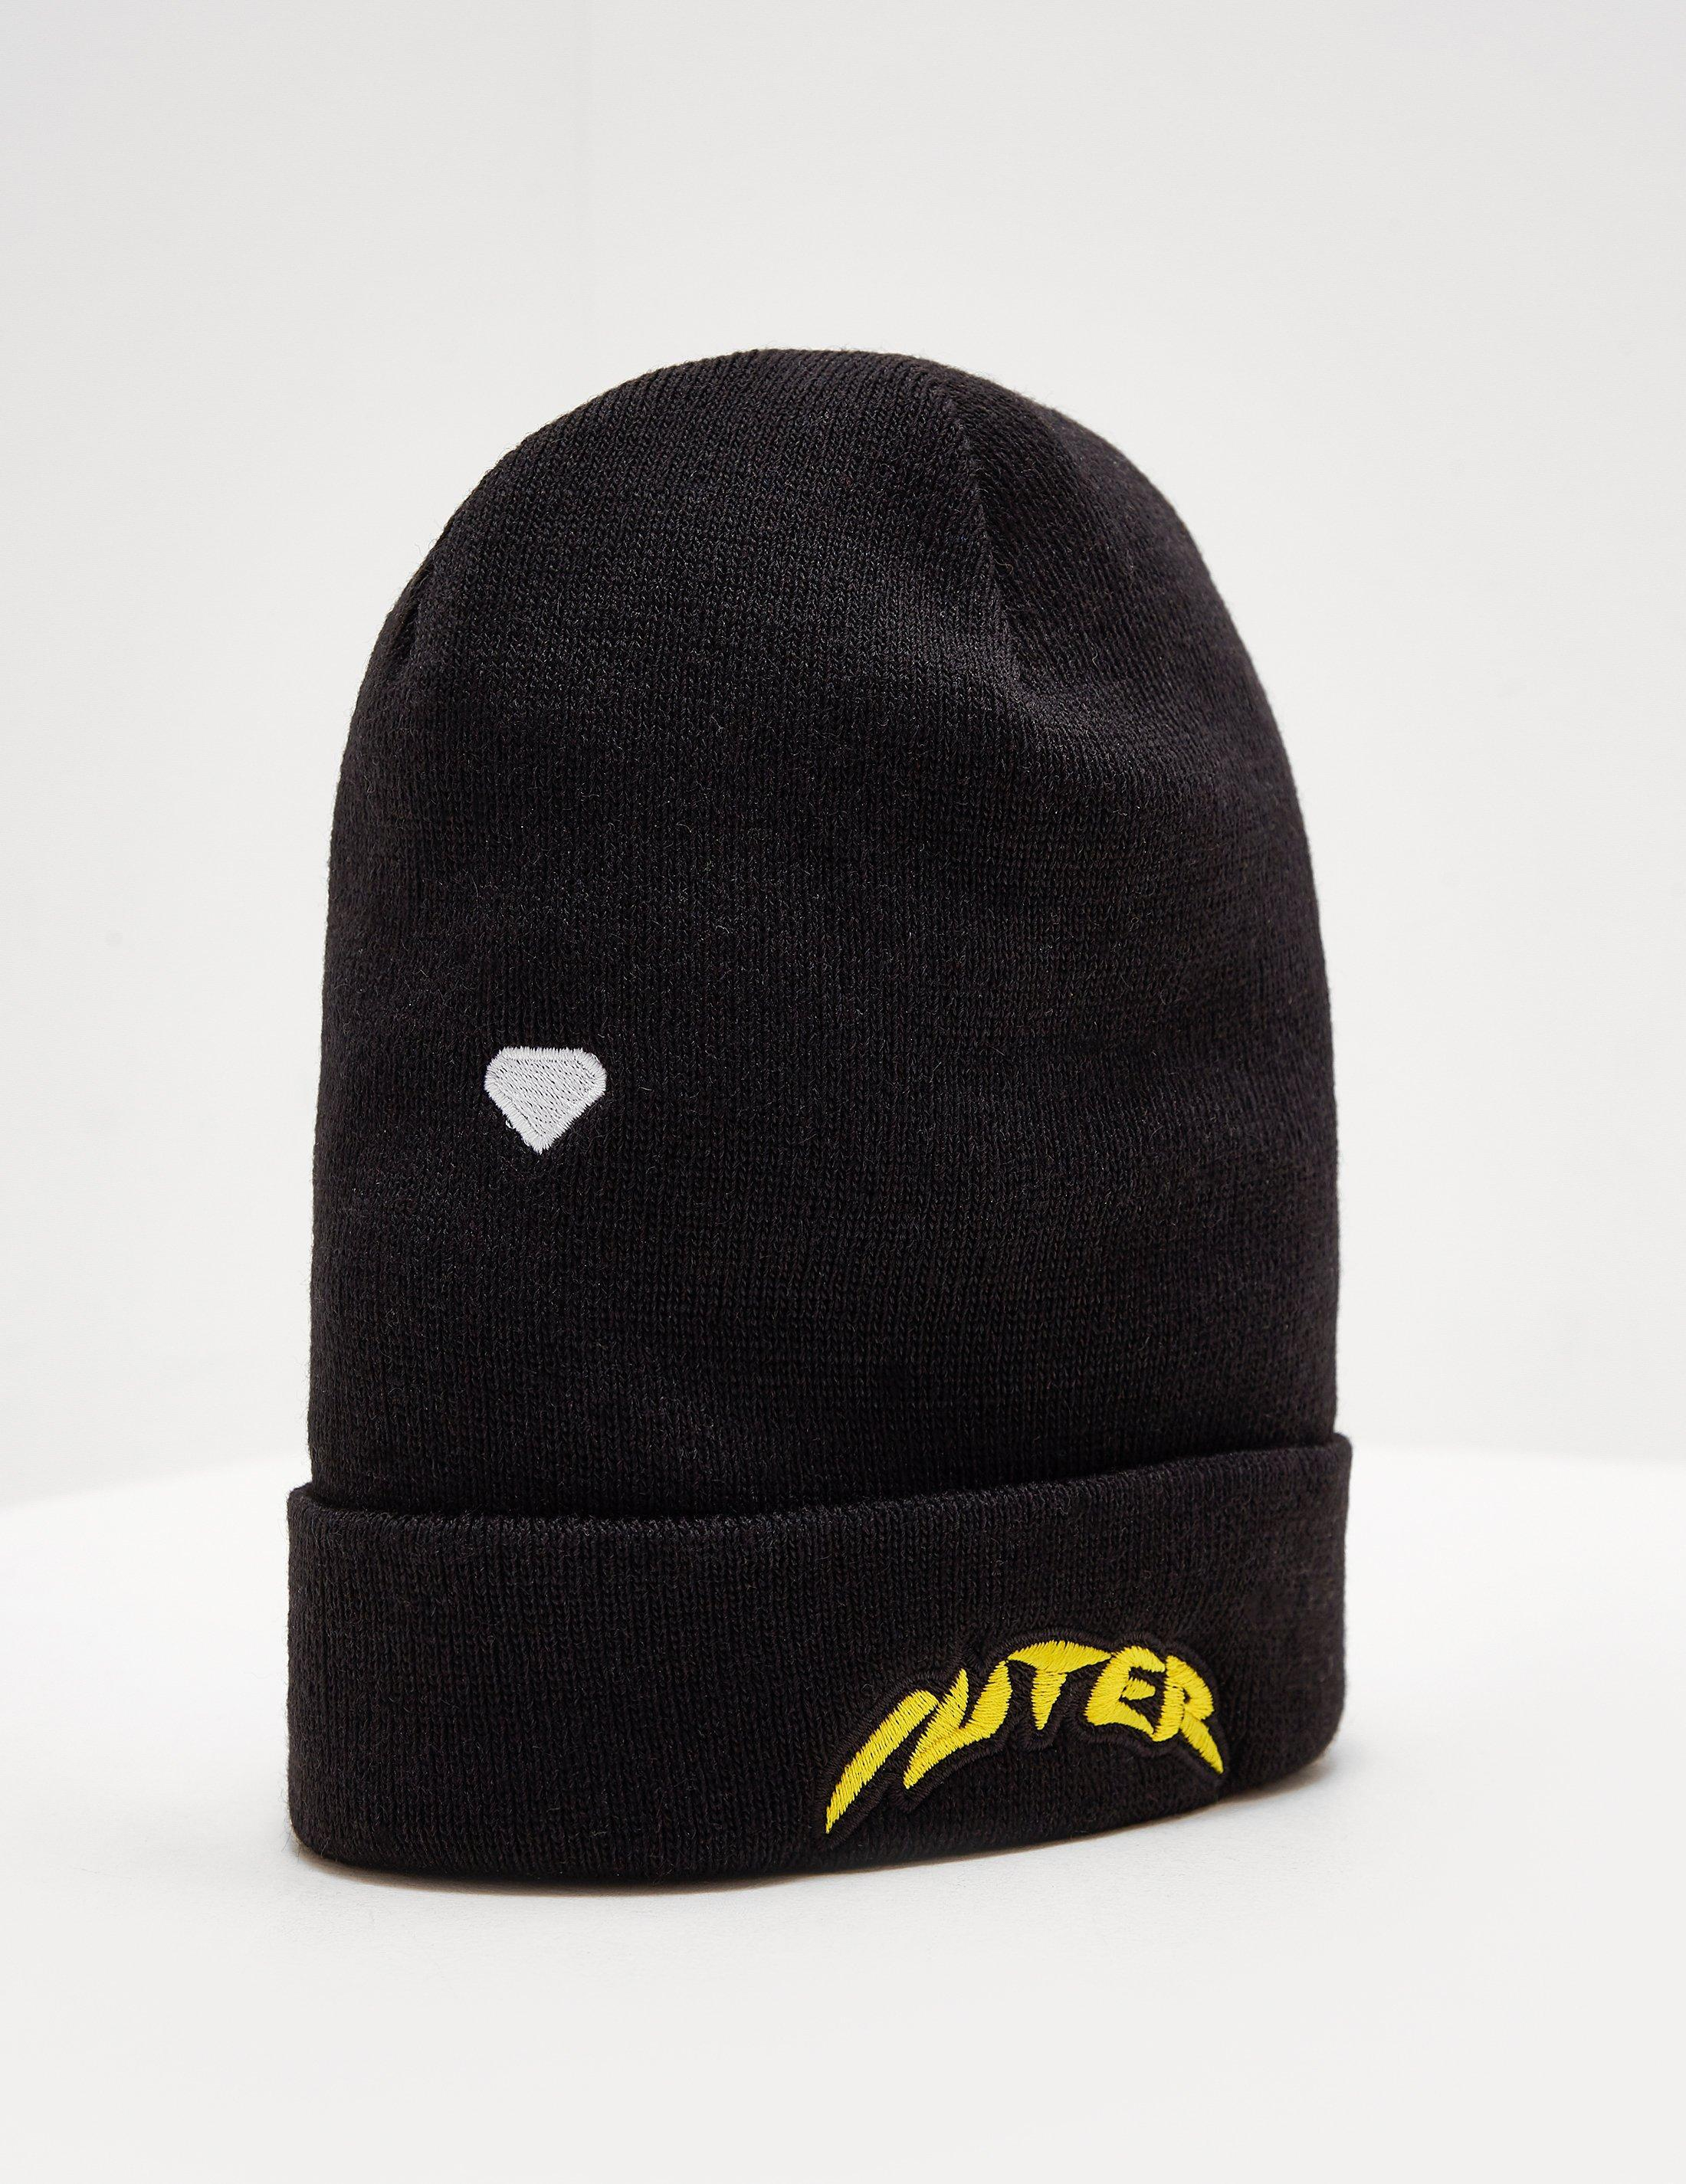 c89d6d0c23d Lyst - Iuter Mens Logo Beanie Black in Black for Men